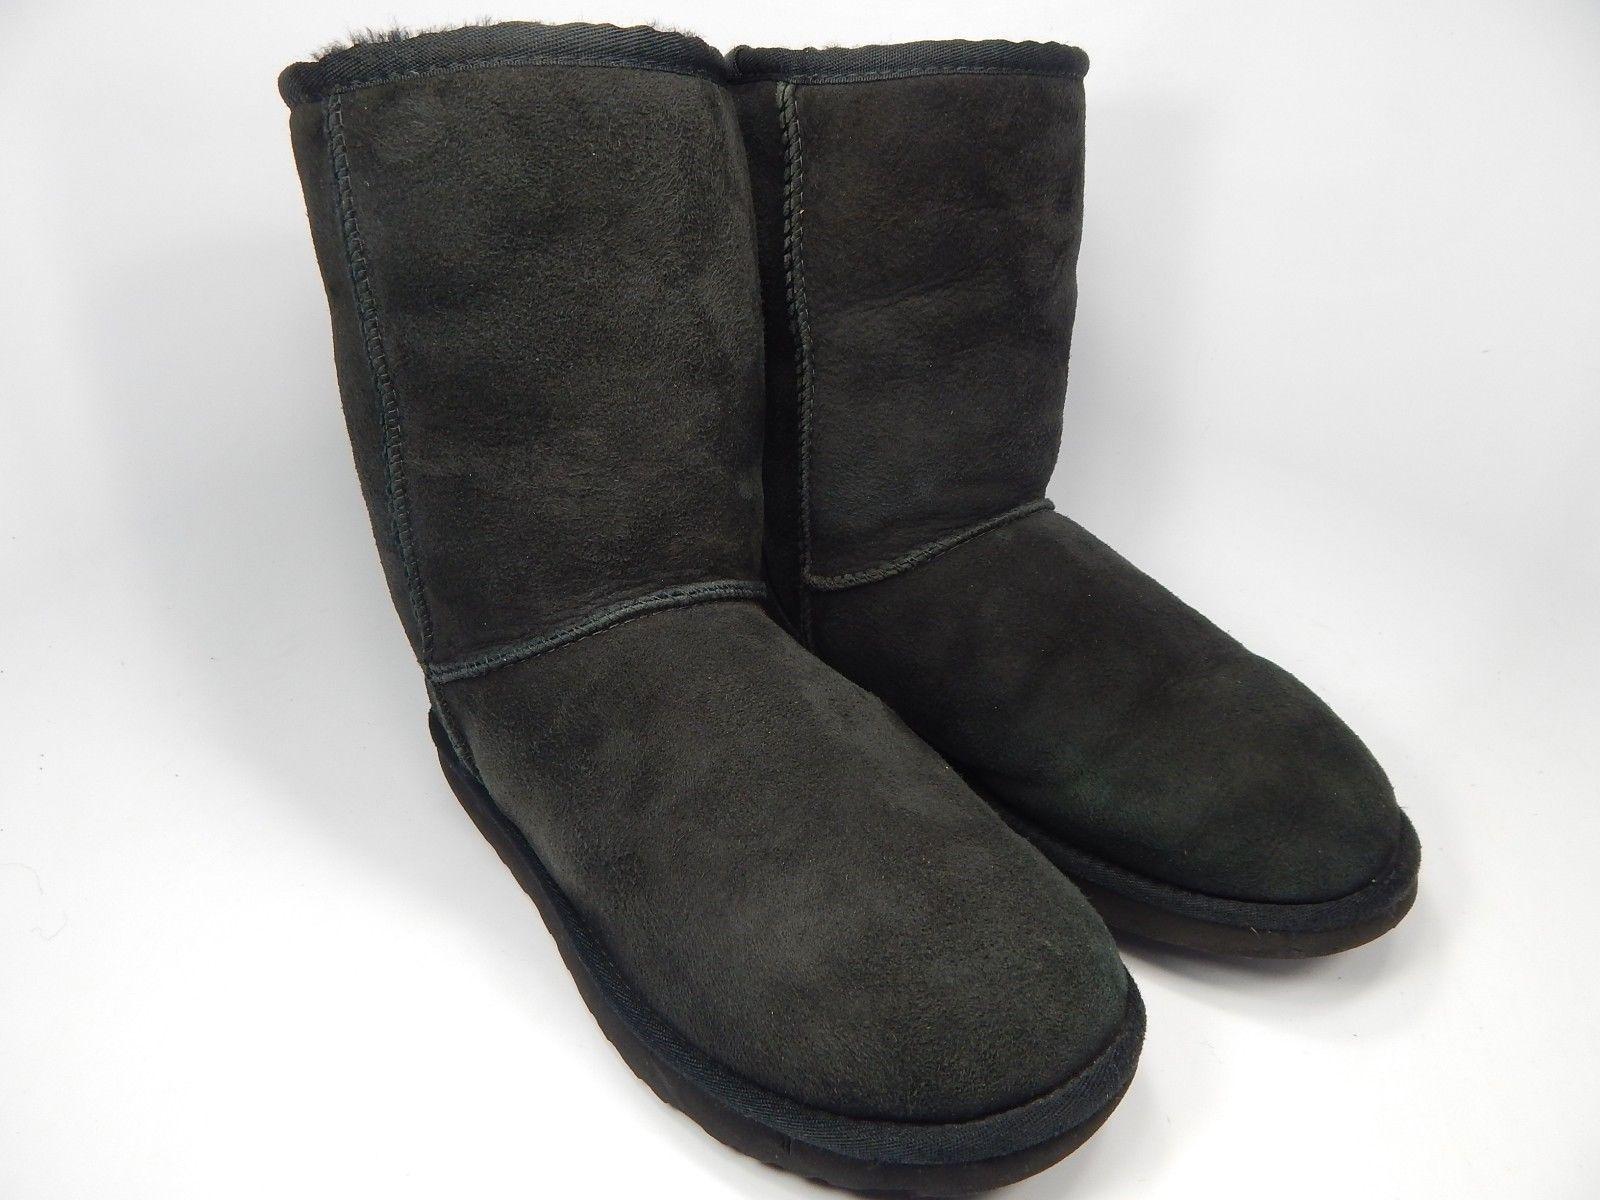 fc08151858c UGG Australia Classic Short Sheepskin Black and 50 similar items